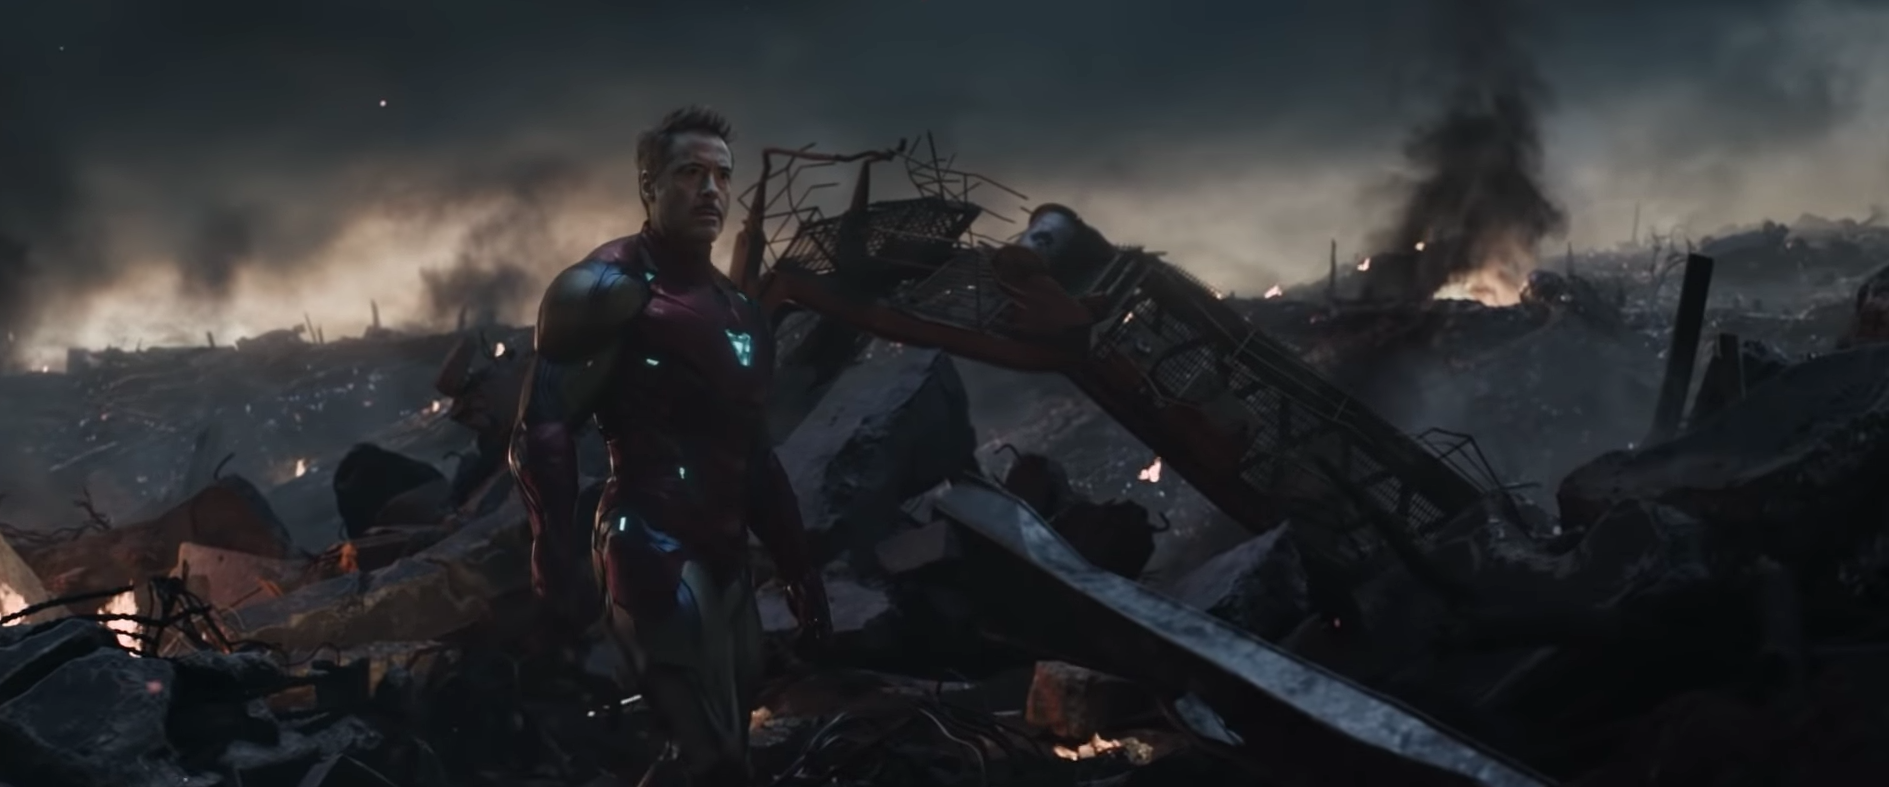 avengers-endgame-final-trailer-15.png